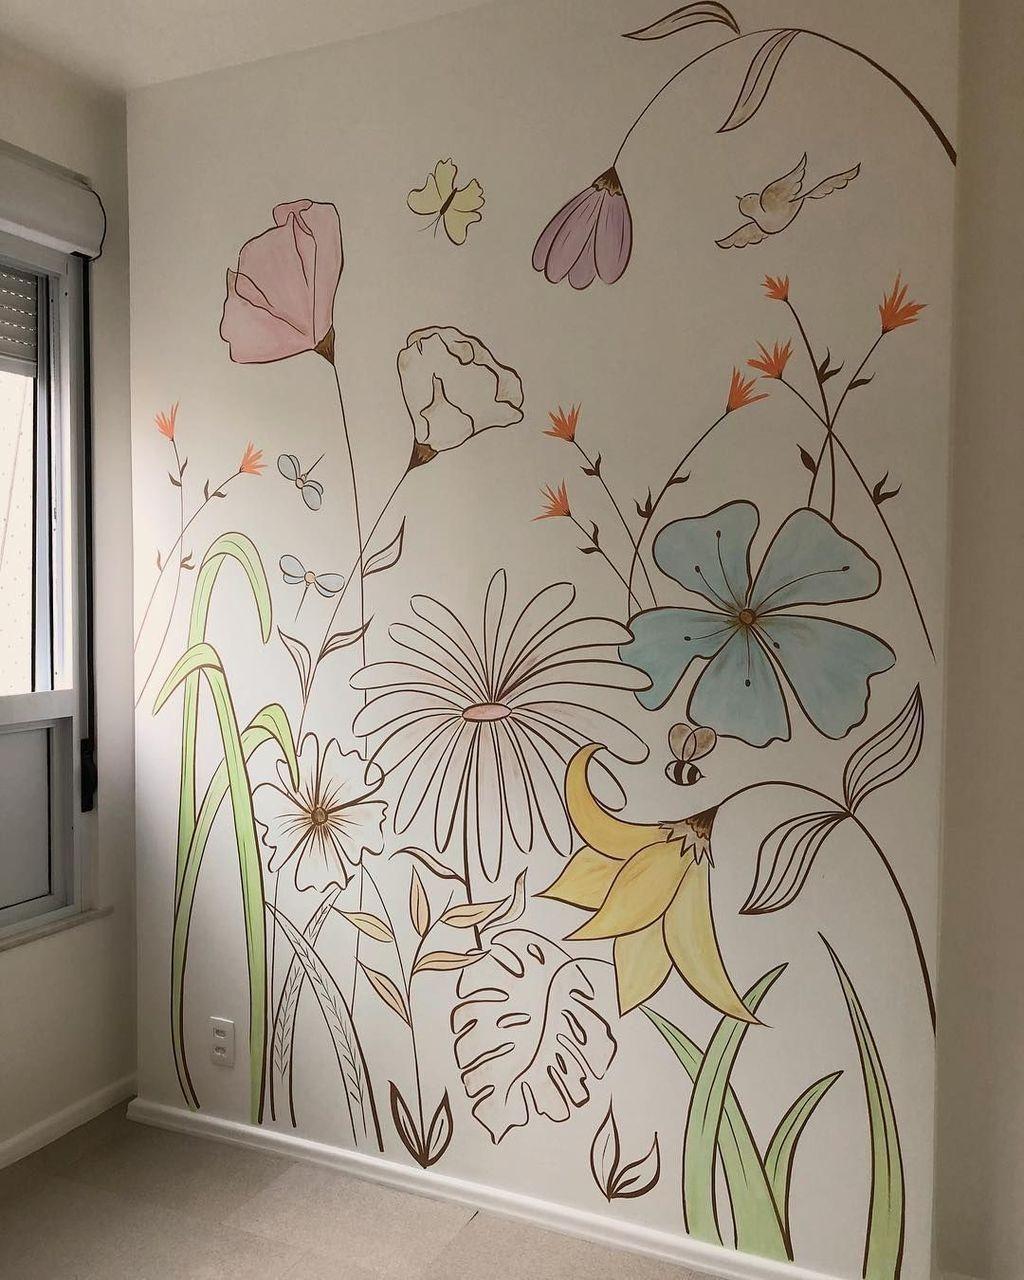 Pitturare casa fai da te guida dalla a alla z: 30 Latest Wall Painting Ideas For Home To Try Interior Design Wall Decor Home Wall Art Wall Murals Diy